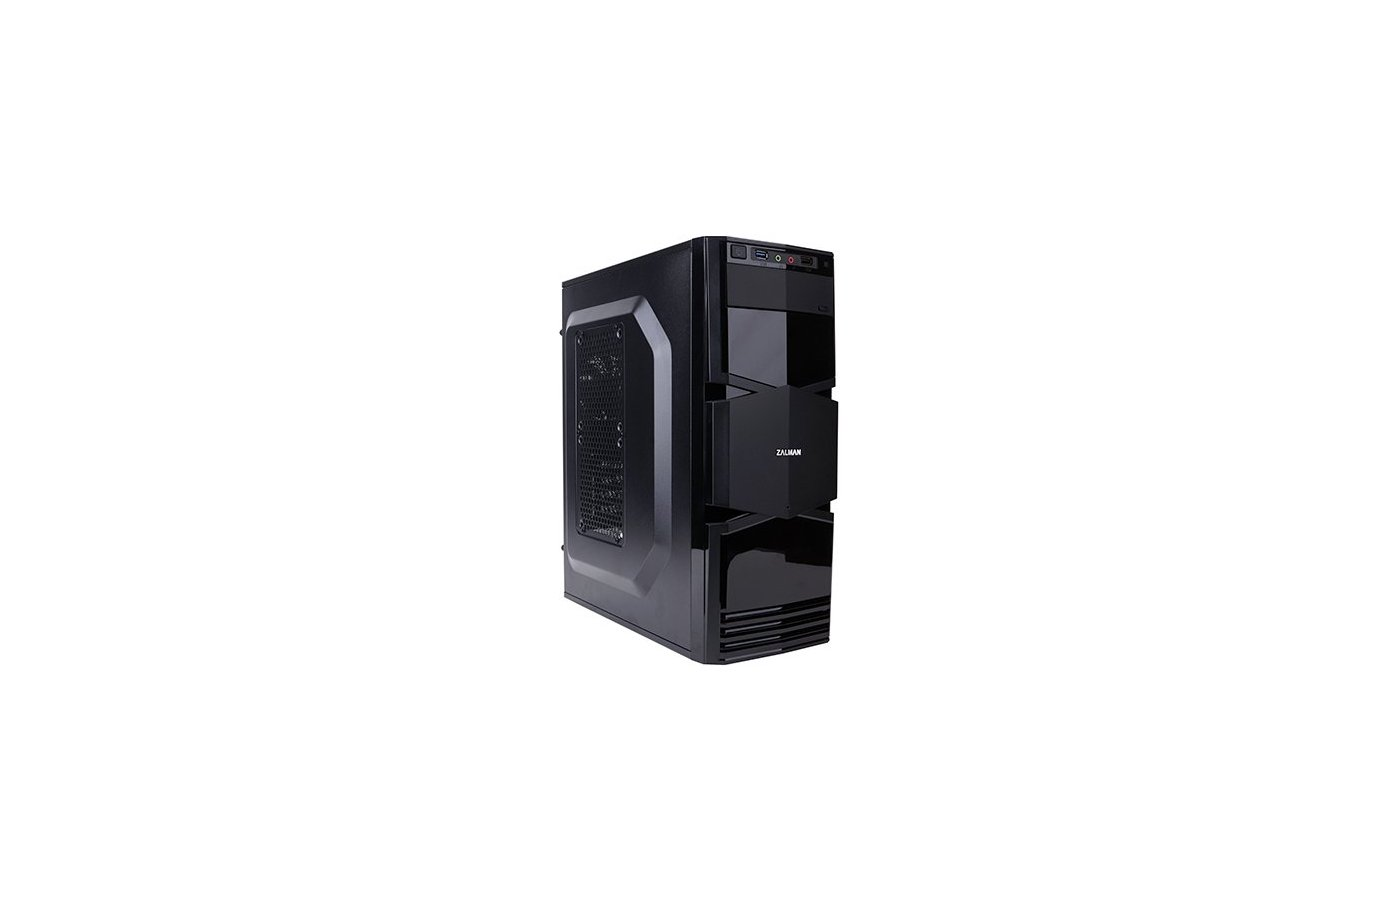 Корпус Zalman ZM-T3 черный w/o PSU mATX 1x80mm 3x120mm 1xUSB2.0 1xUSB3.0 audio bott PSU